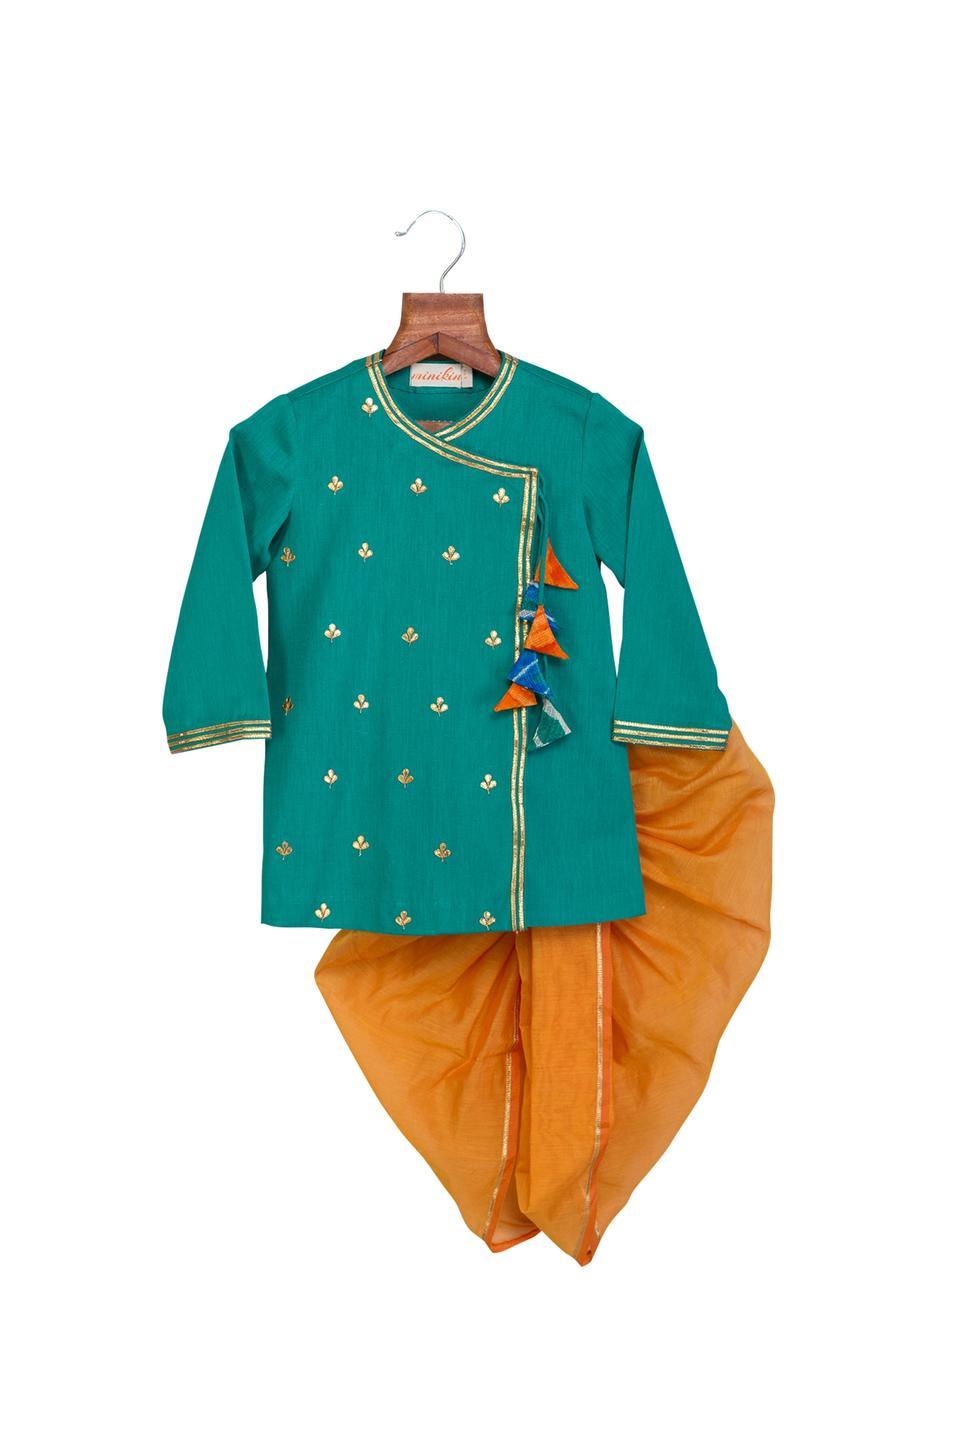 Turquoise & grey cotton linen & chanderi gota patti work & colorful tassels anghrakha with dhoti